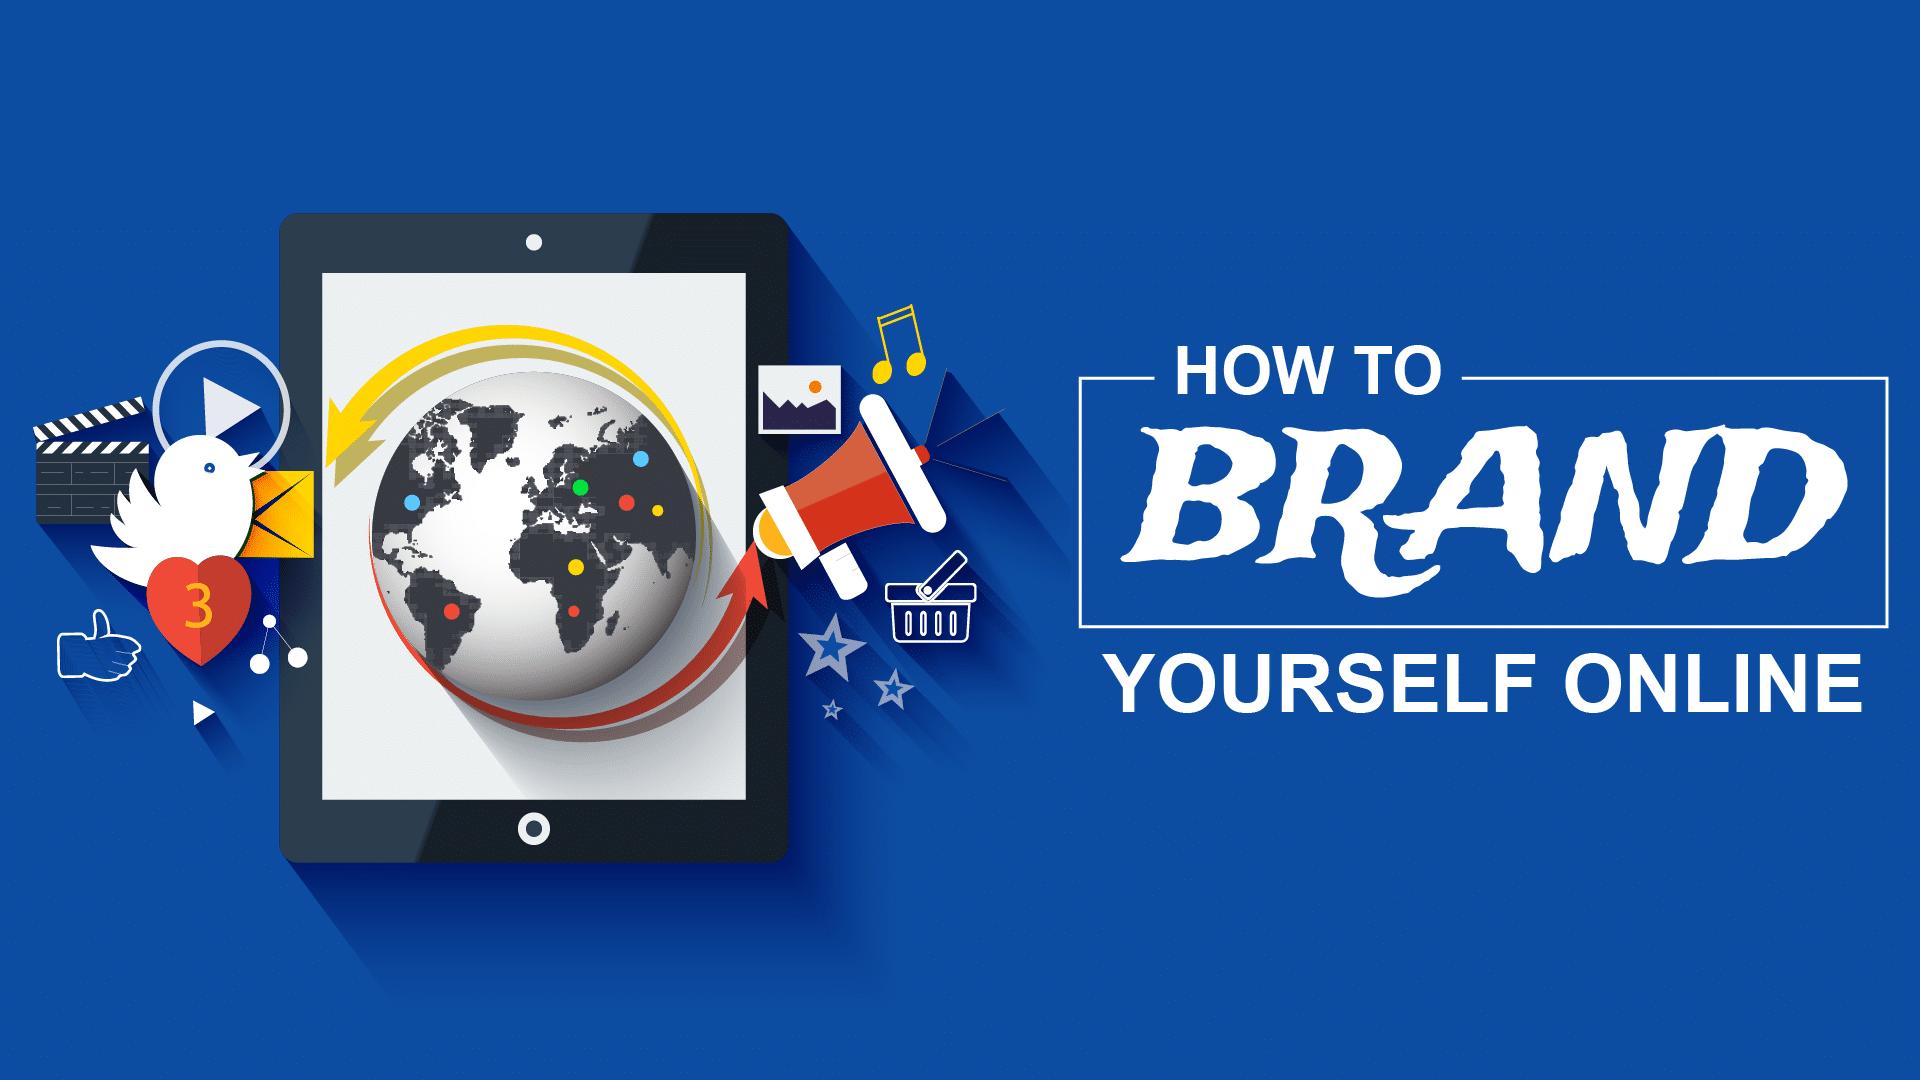 Brand-yourself-online-Facebook-Event-Header